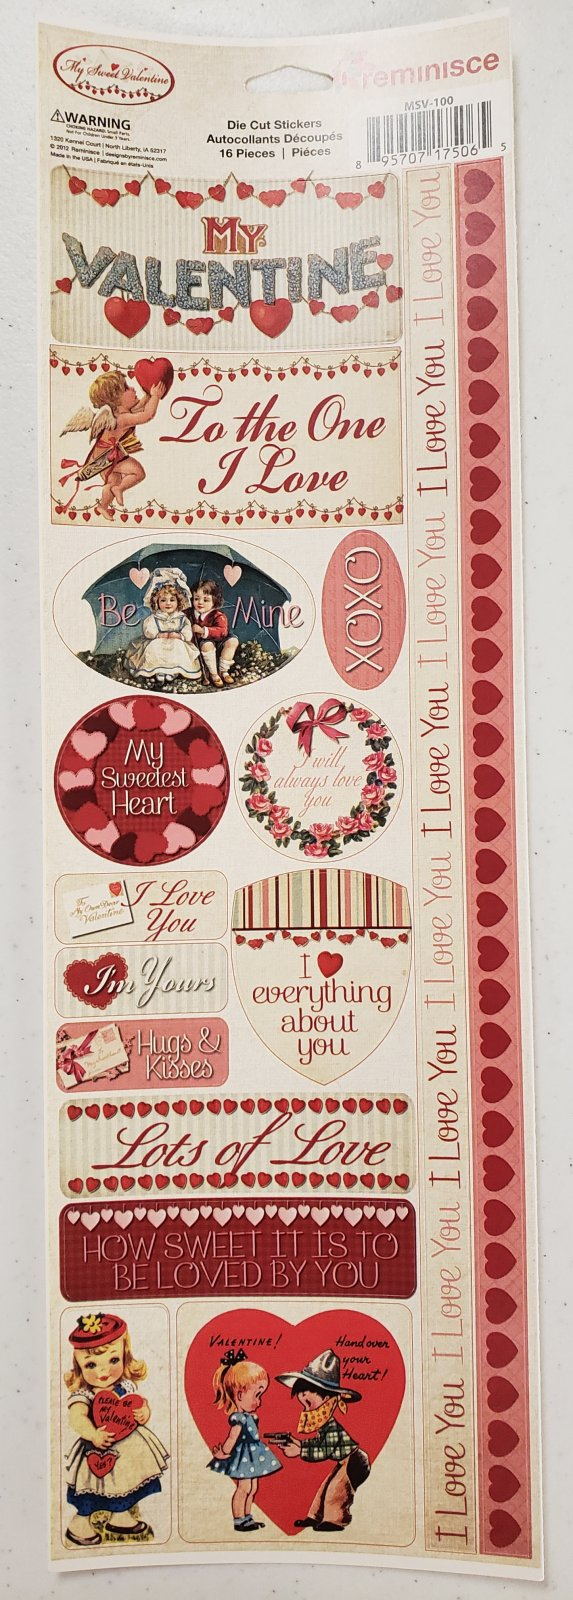 Rem My Valentine